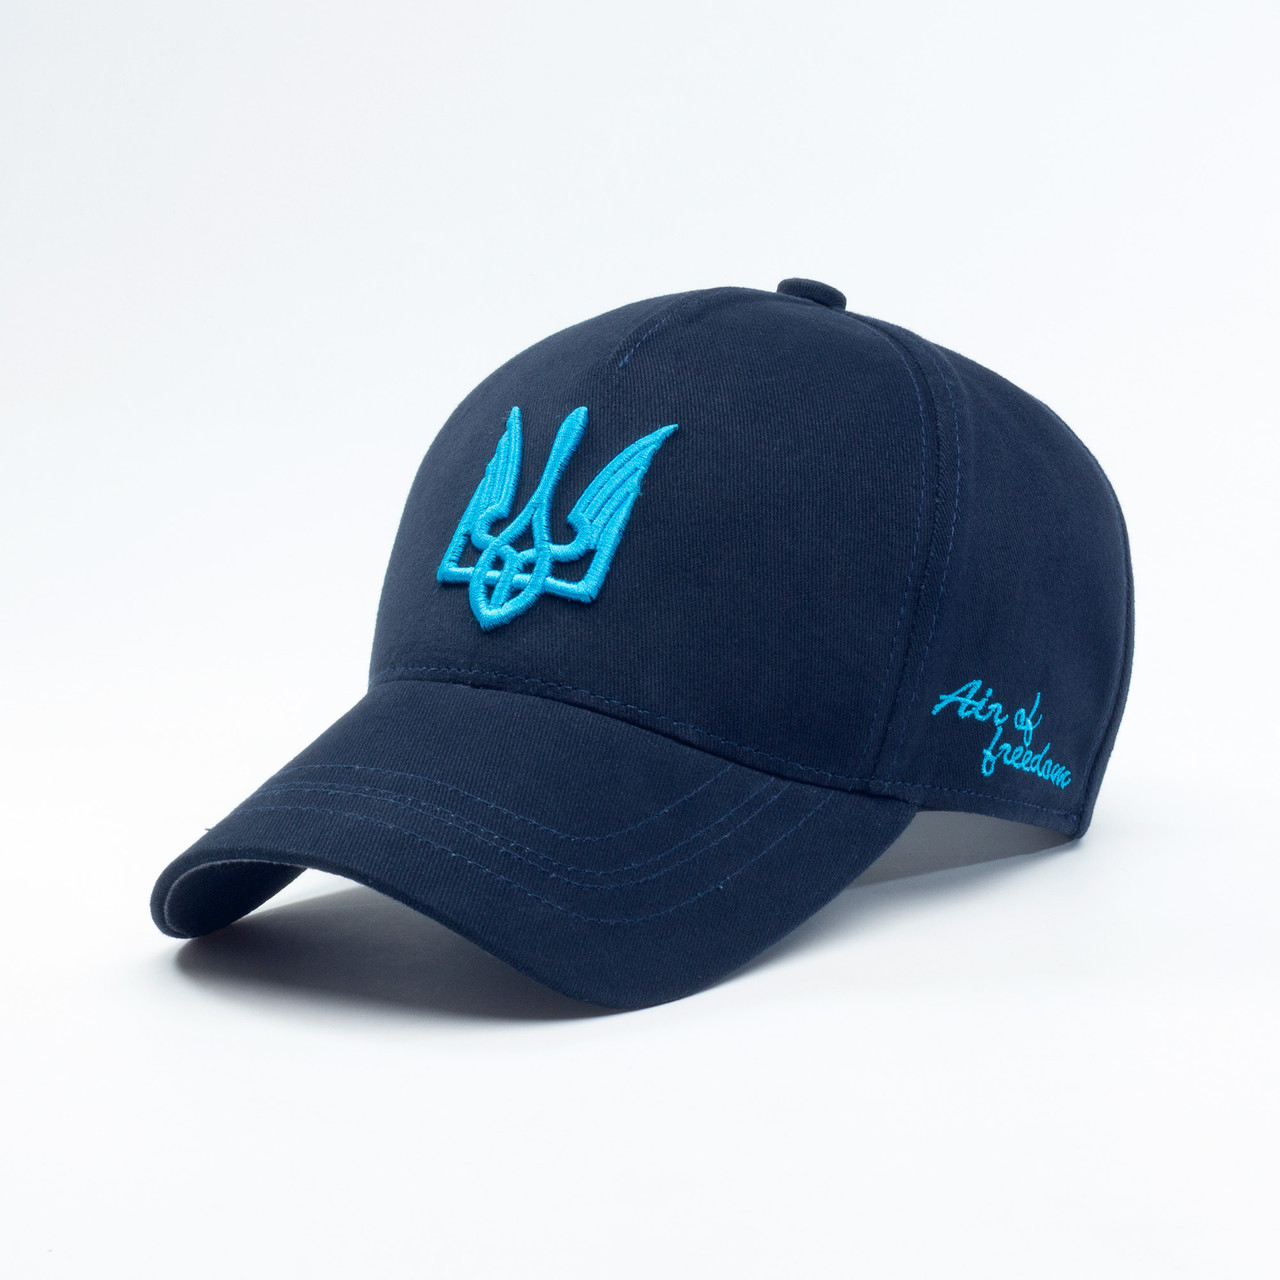 Купить Кепка бейсболка мужская INAL air of freedom XL / 59-60 RU Синий 36959